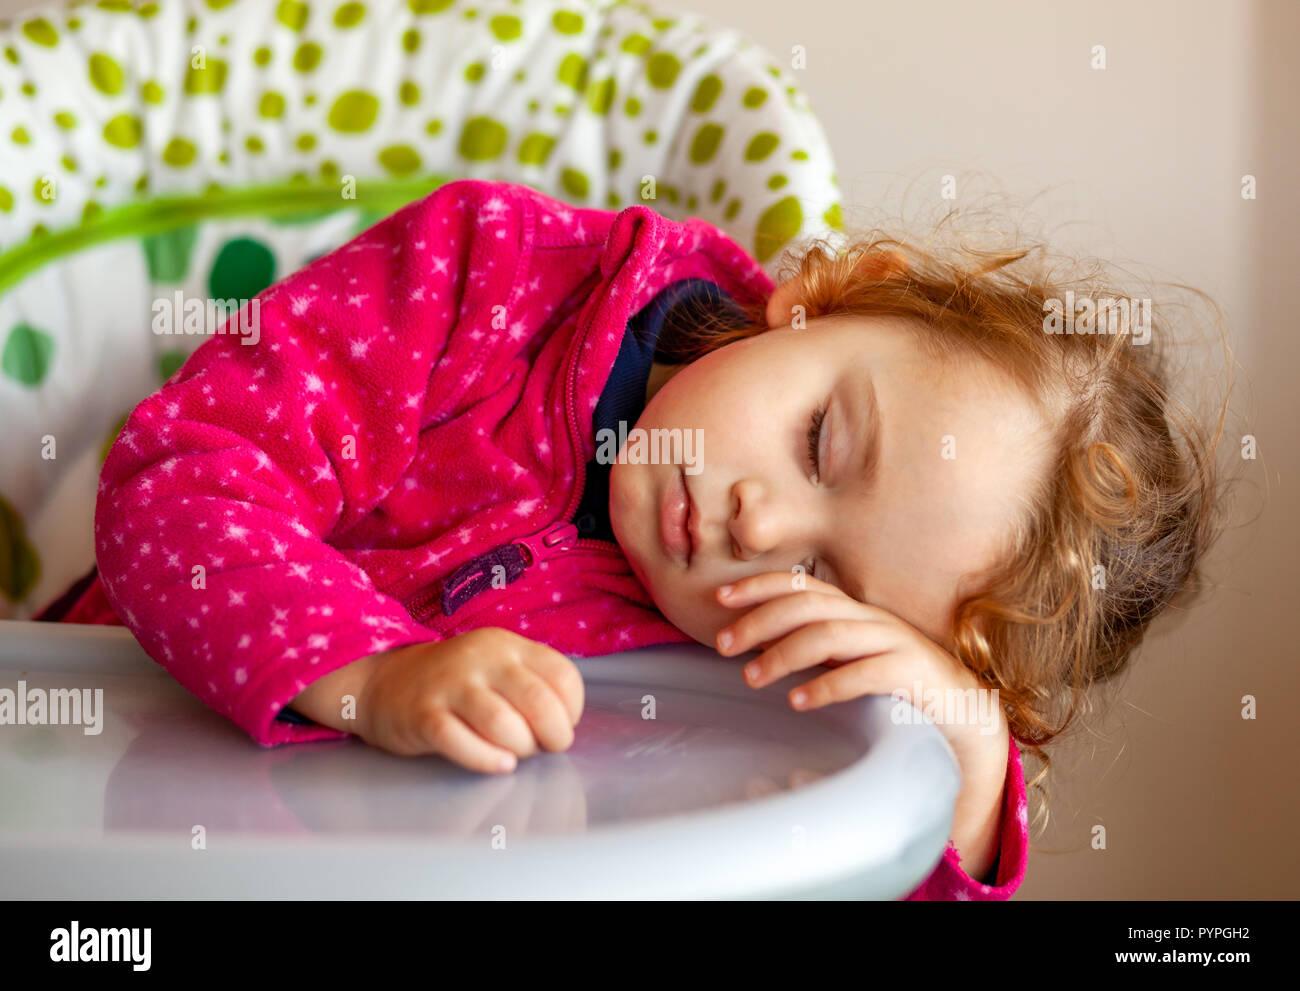 toddler asleep photos toddler asleep images alamy. Black Bedroom Furniture Sets. Home Design Ideas